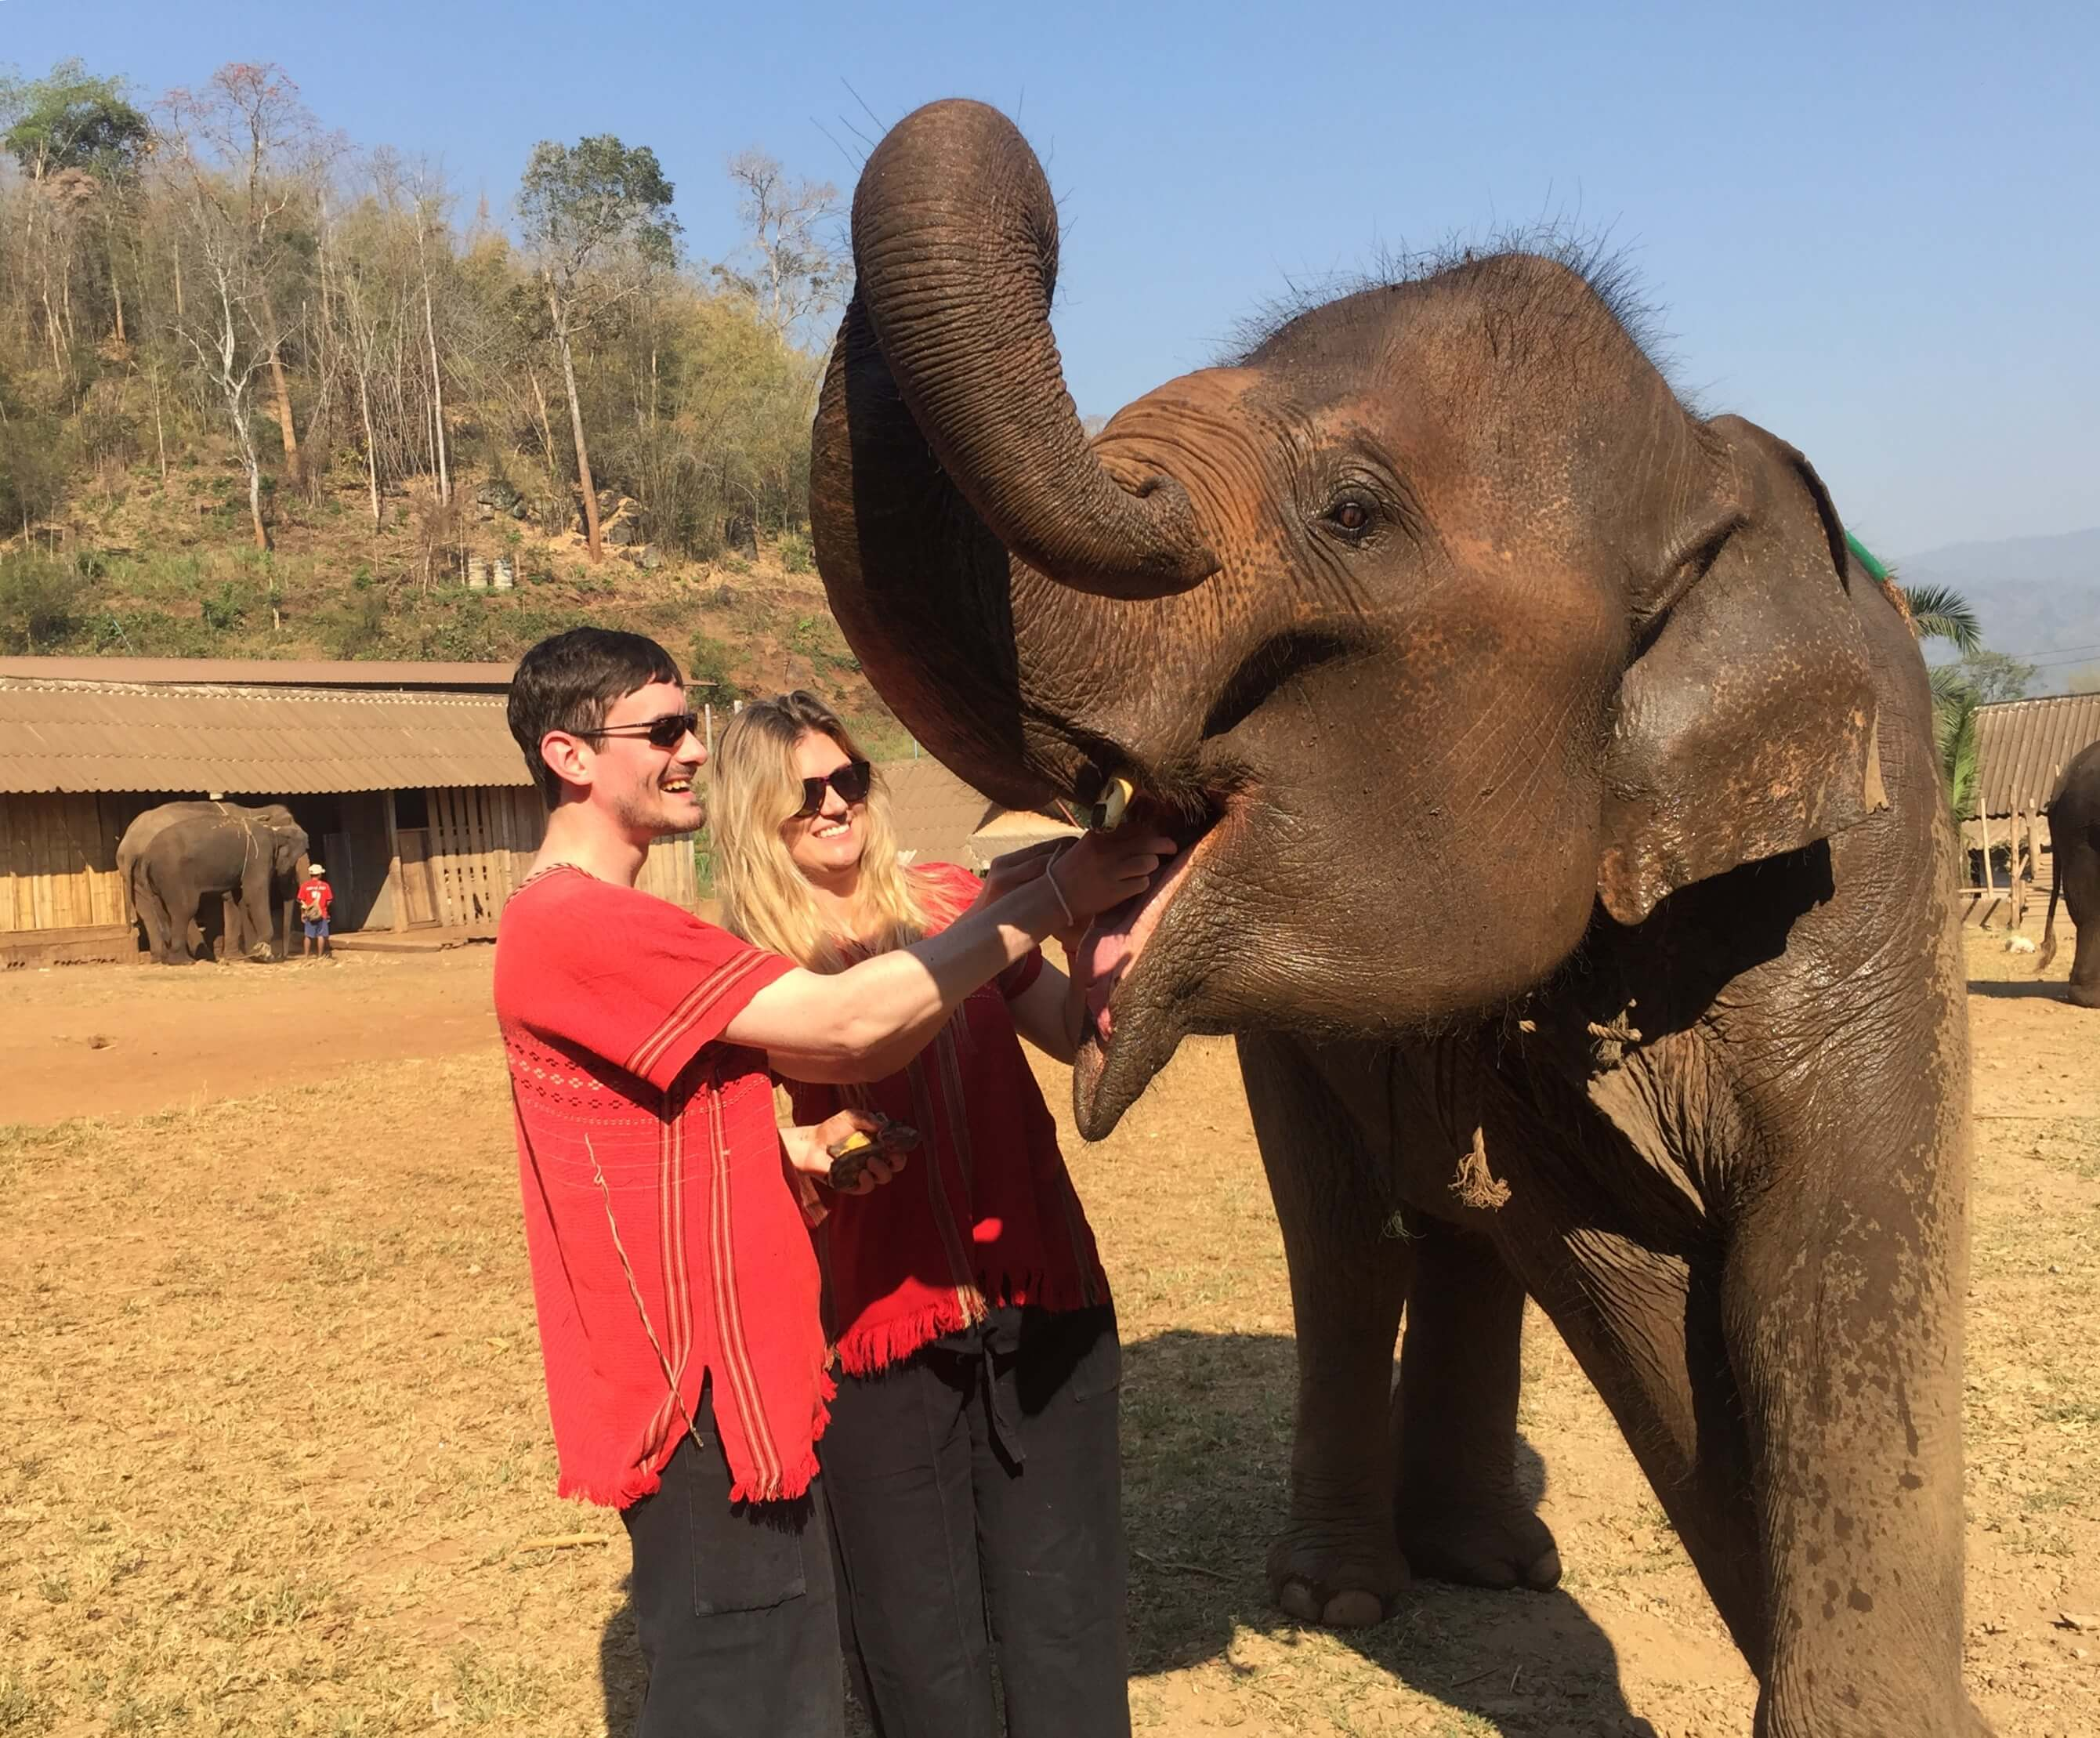 2 people feeding an elephant